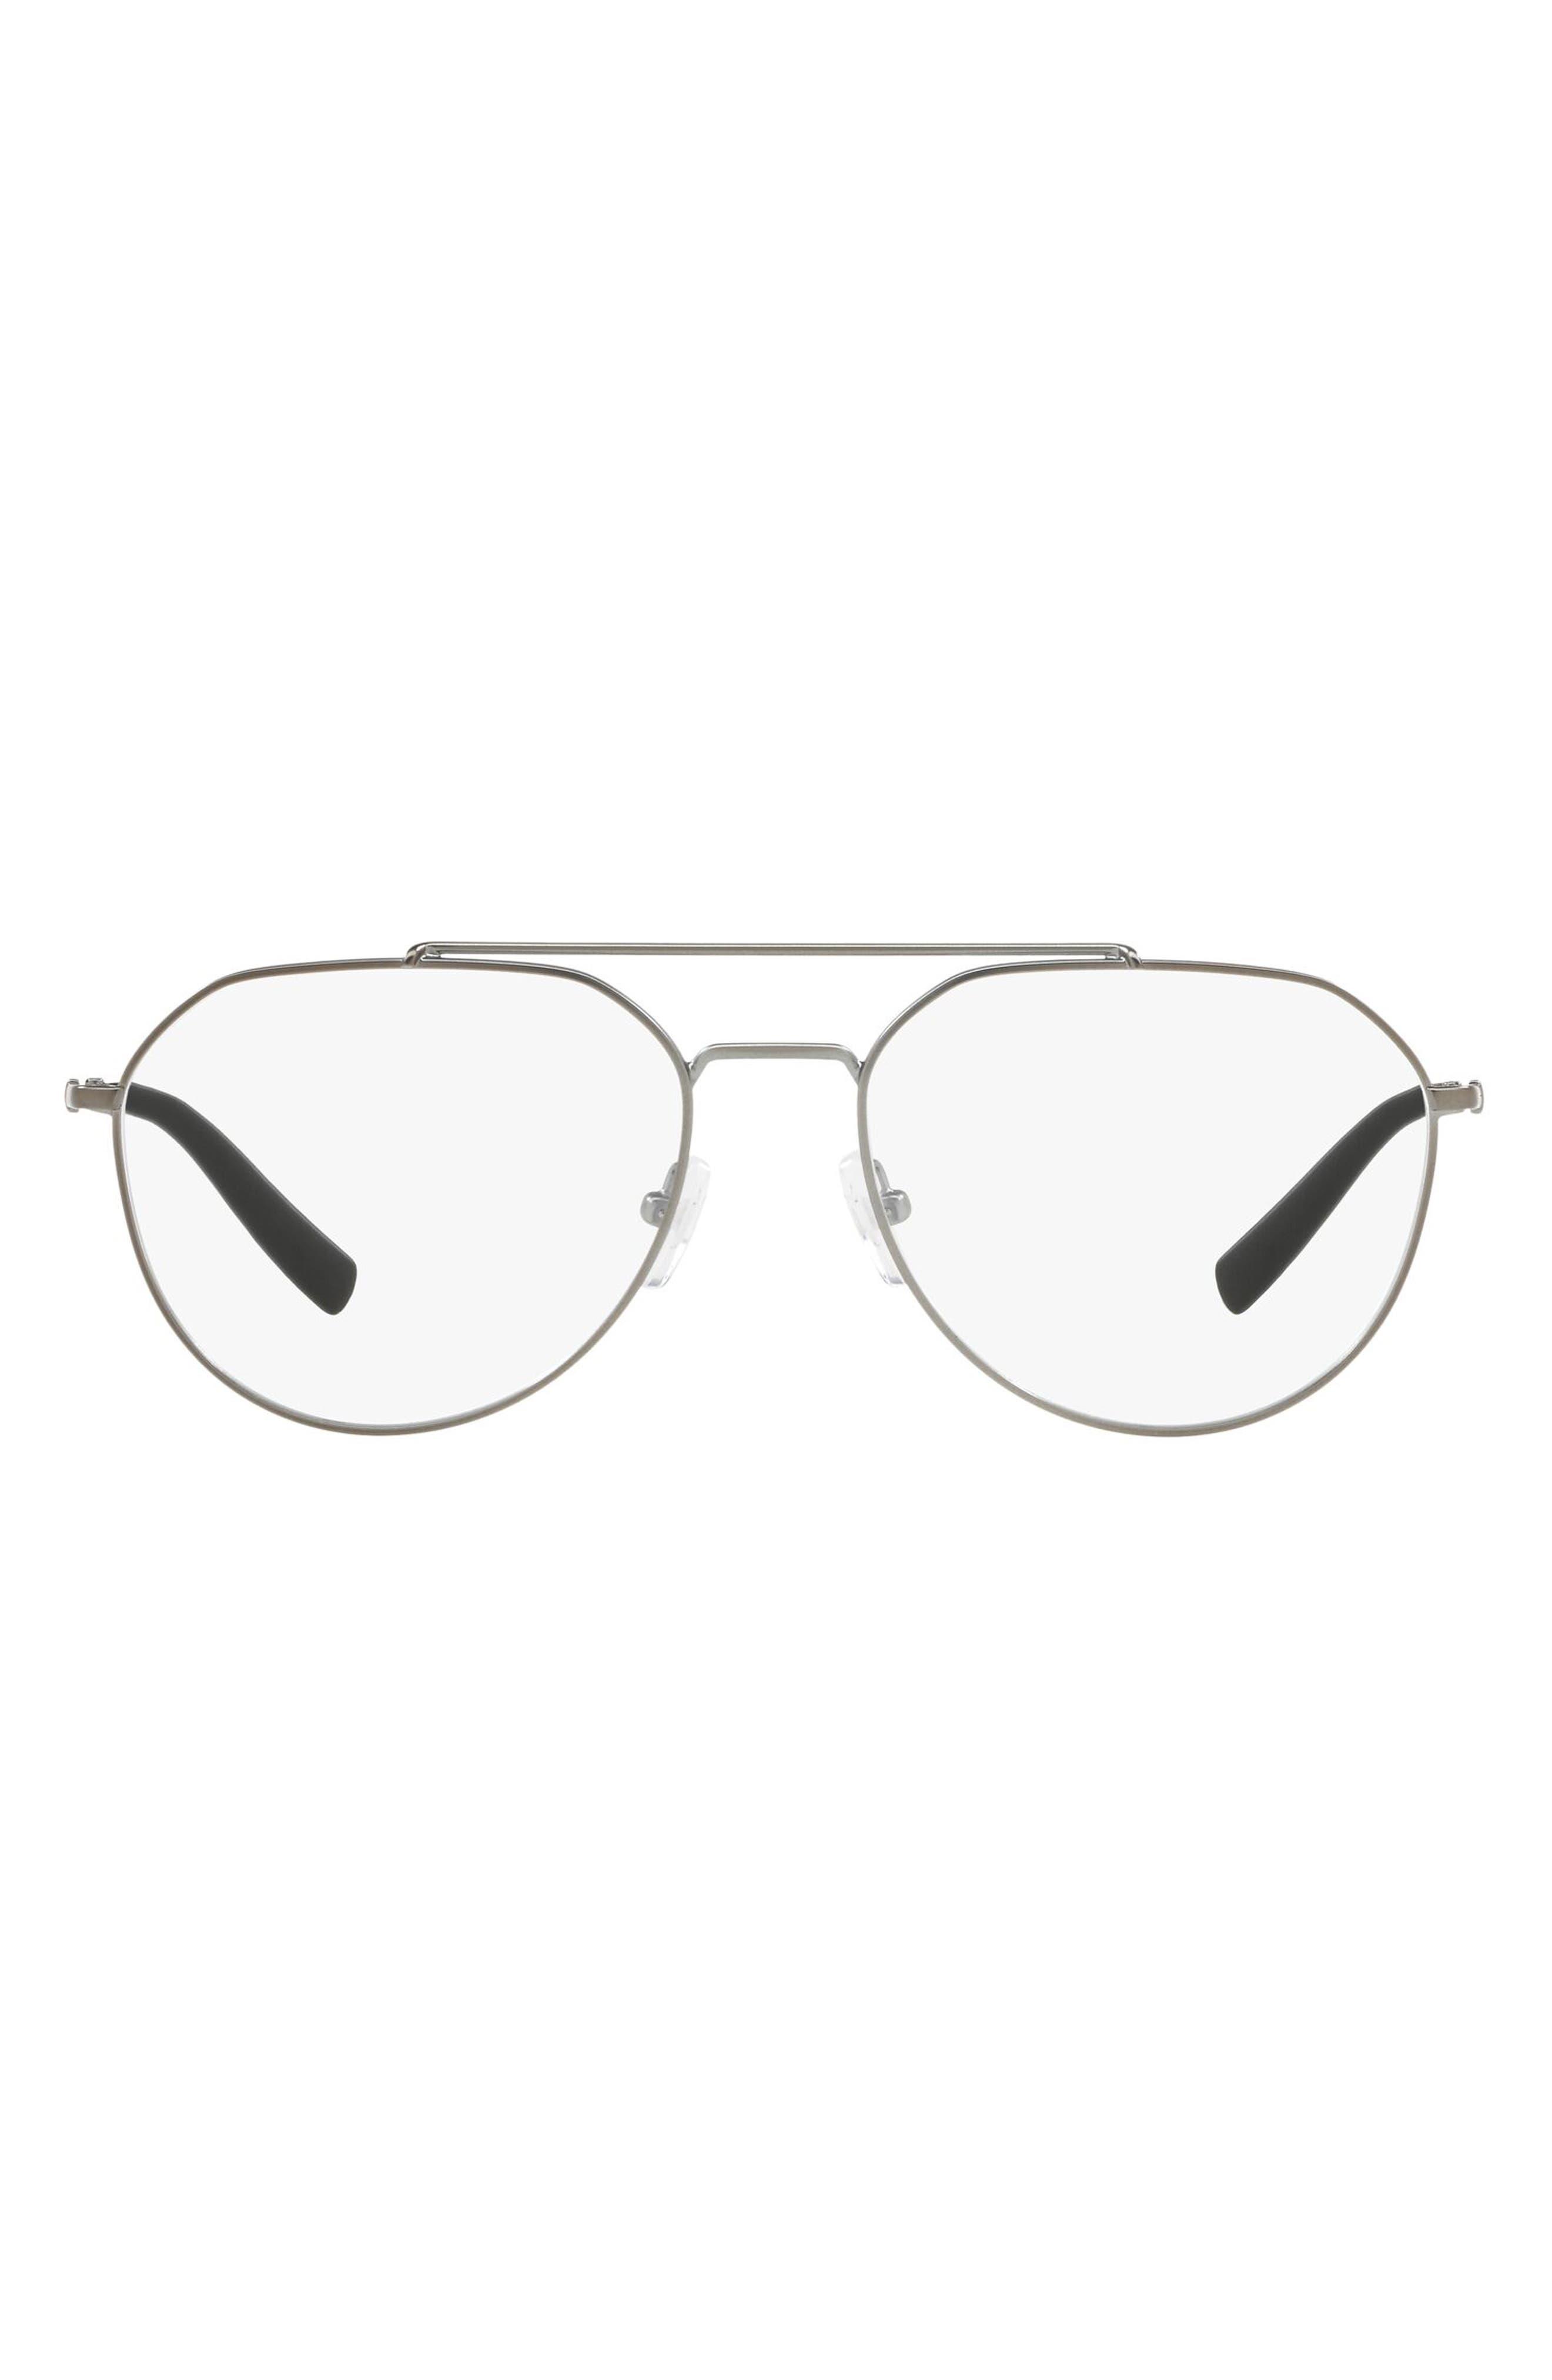 57mm Aviator Optical Glasses